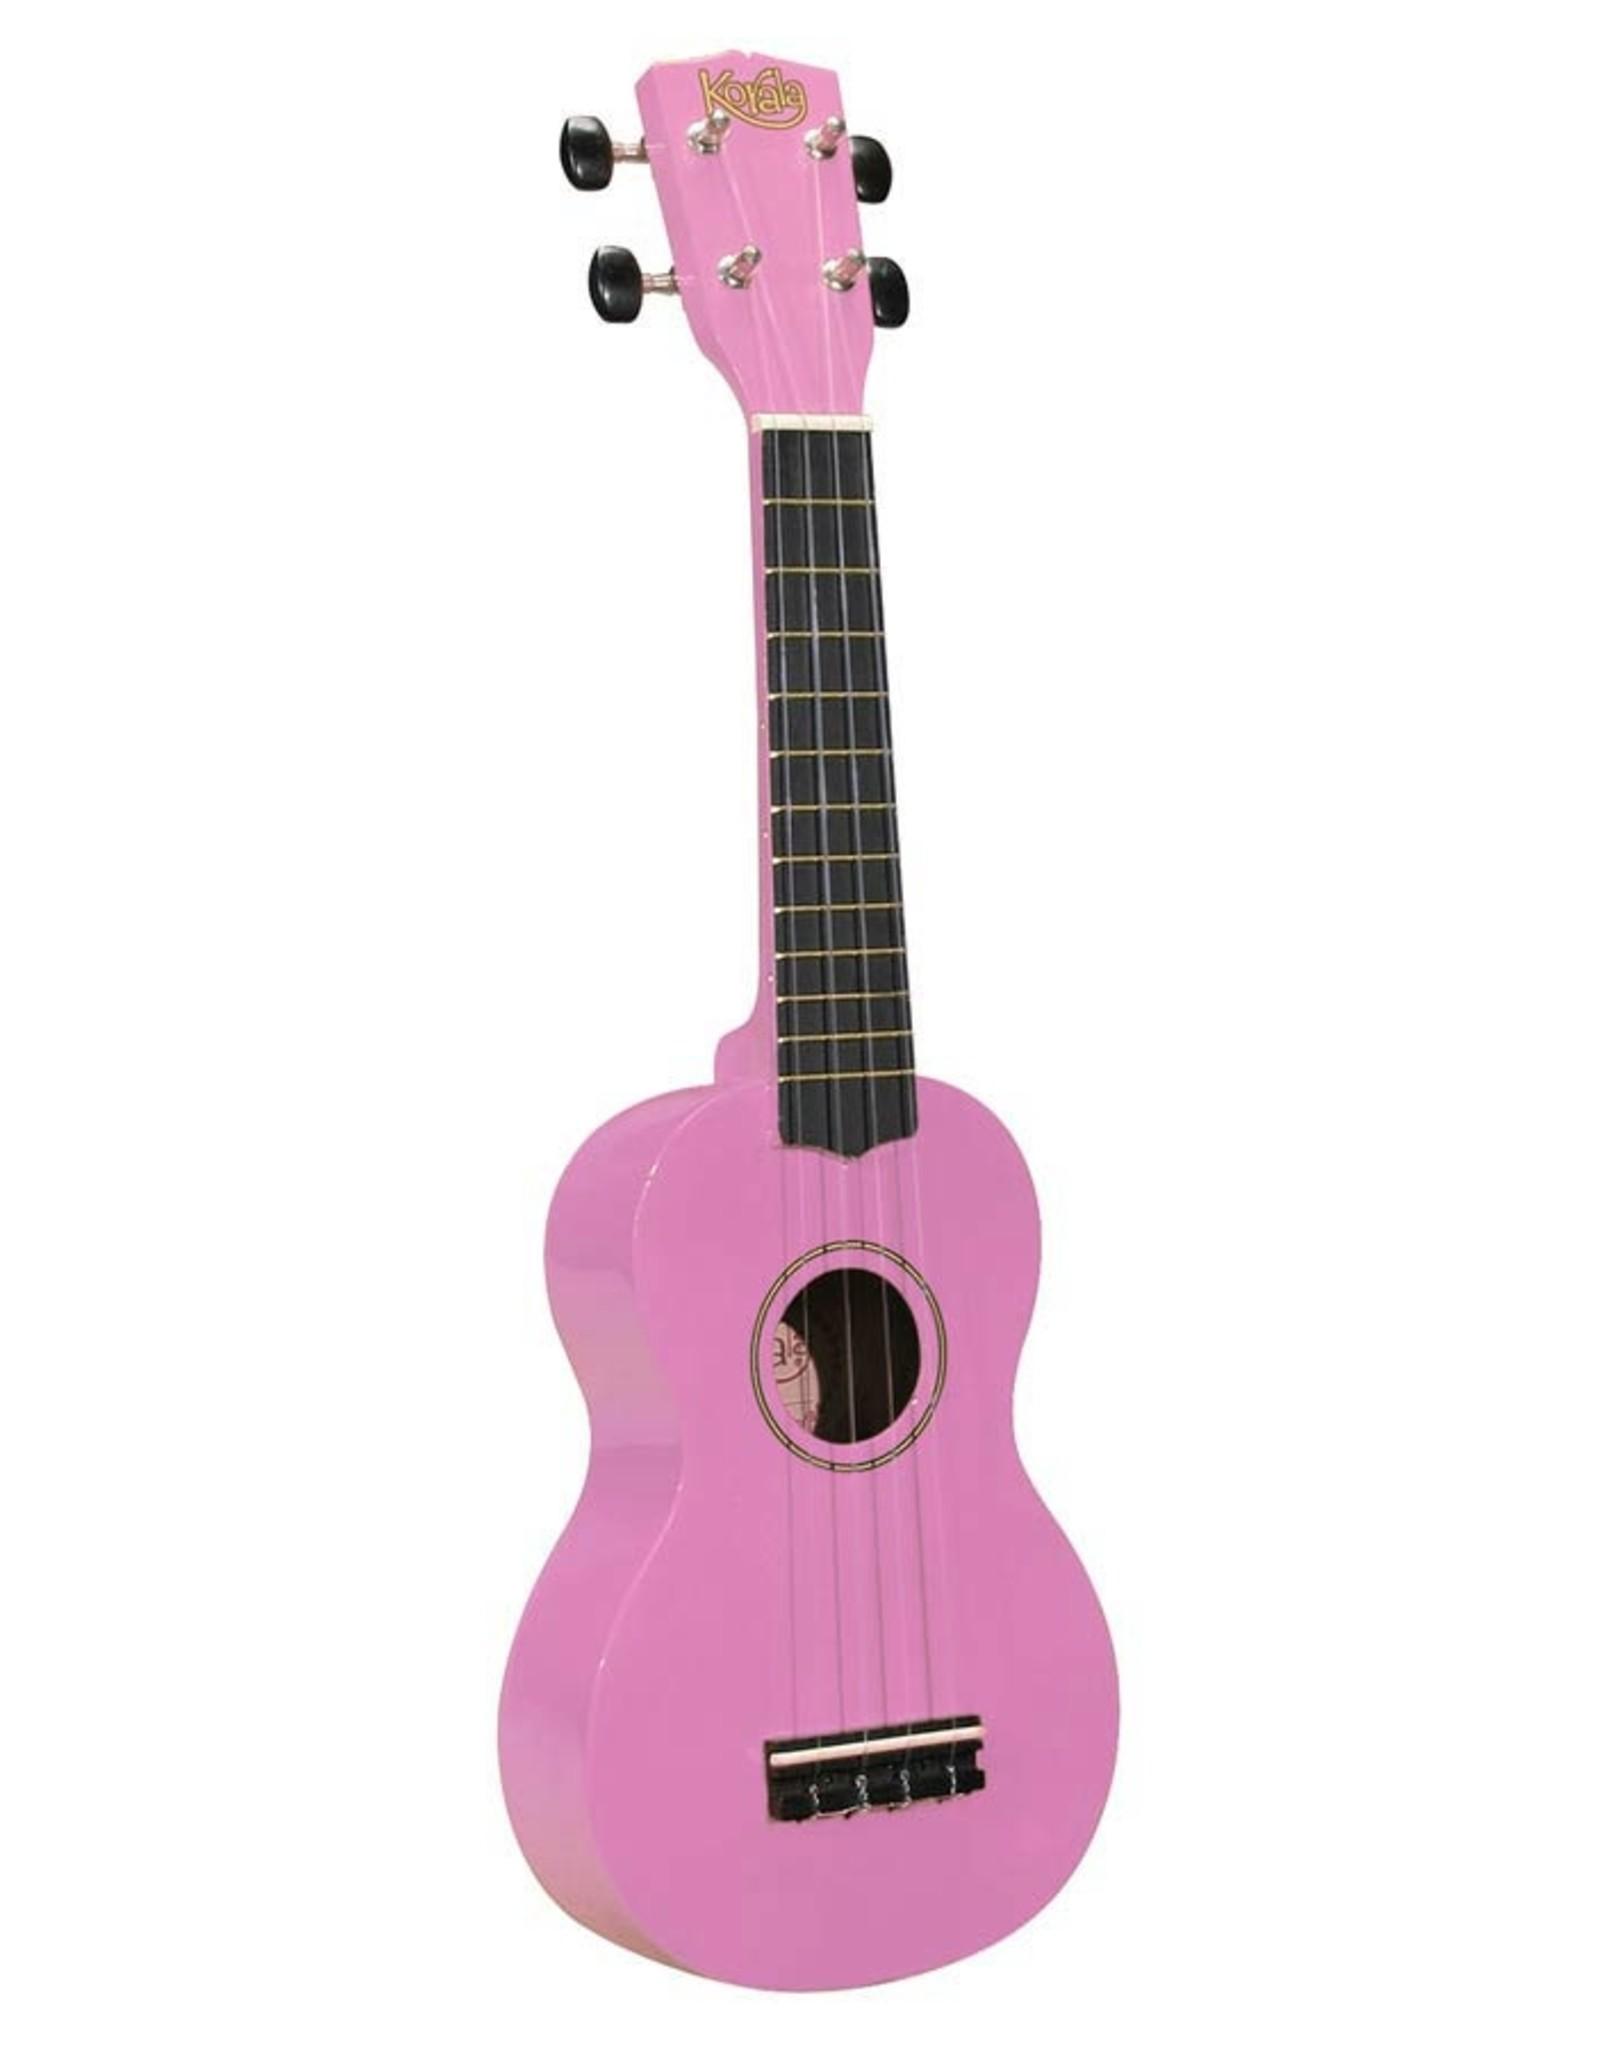 Korala UKS-30-PK| Korala sopraan ukelele met gitaarmechanieken